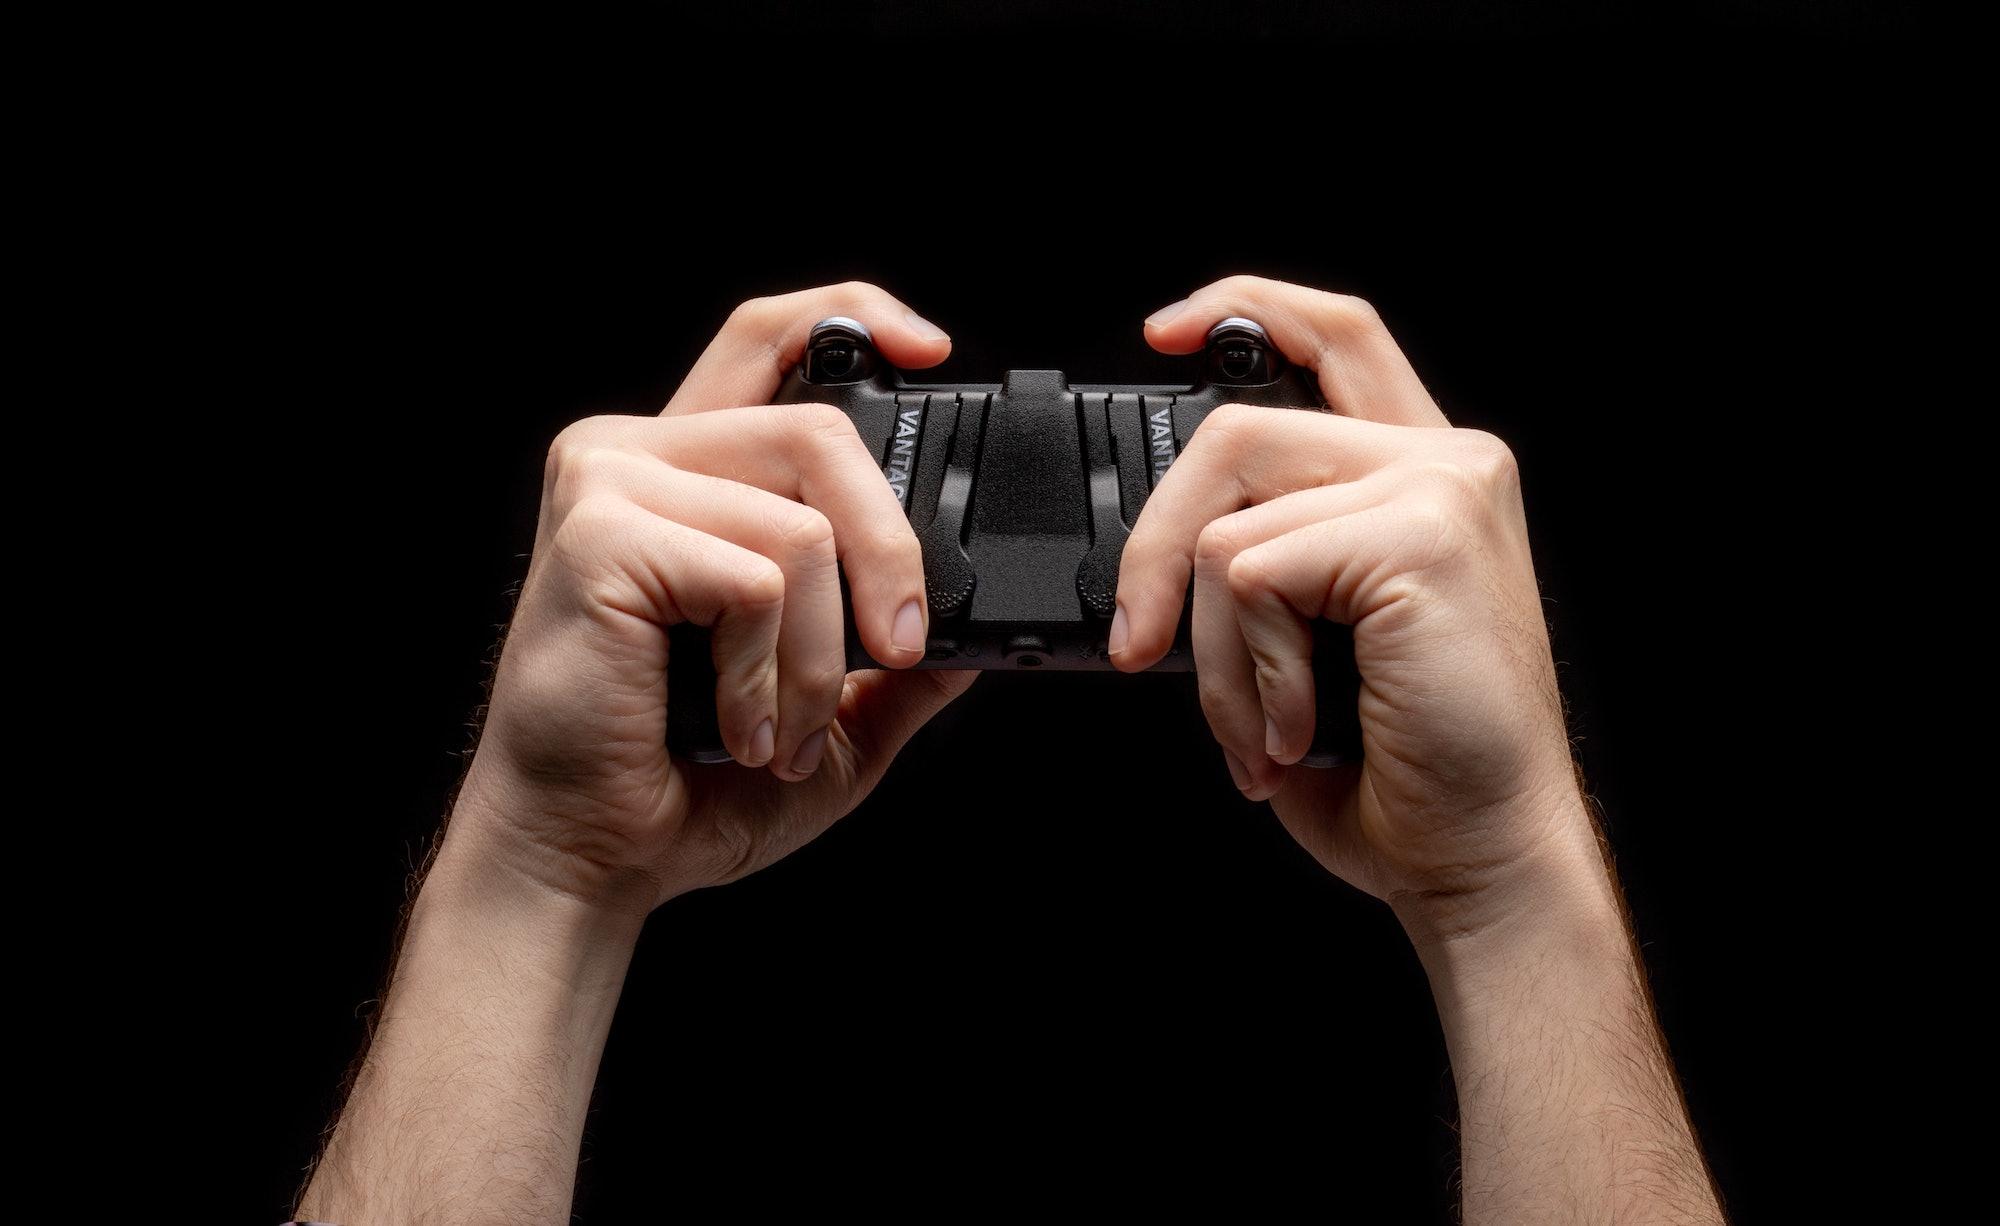 scuf vantage playstation 4 ps4 controller